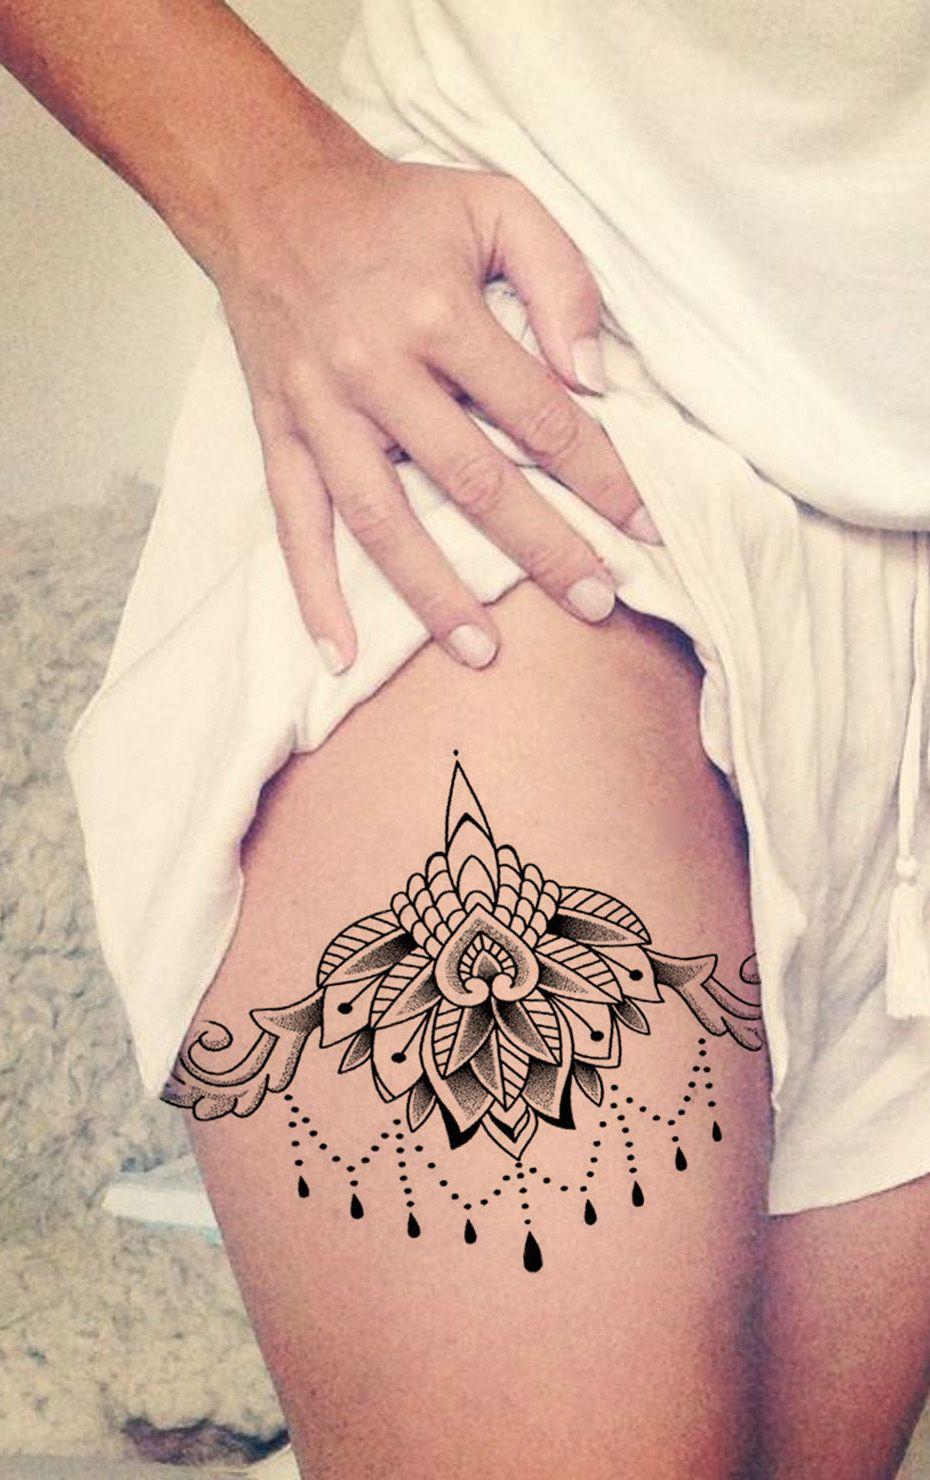 Ceylon Lace Lotus Chandelier Temporary Tattoo Thigh Tattoos